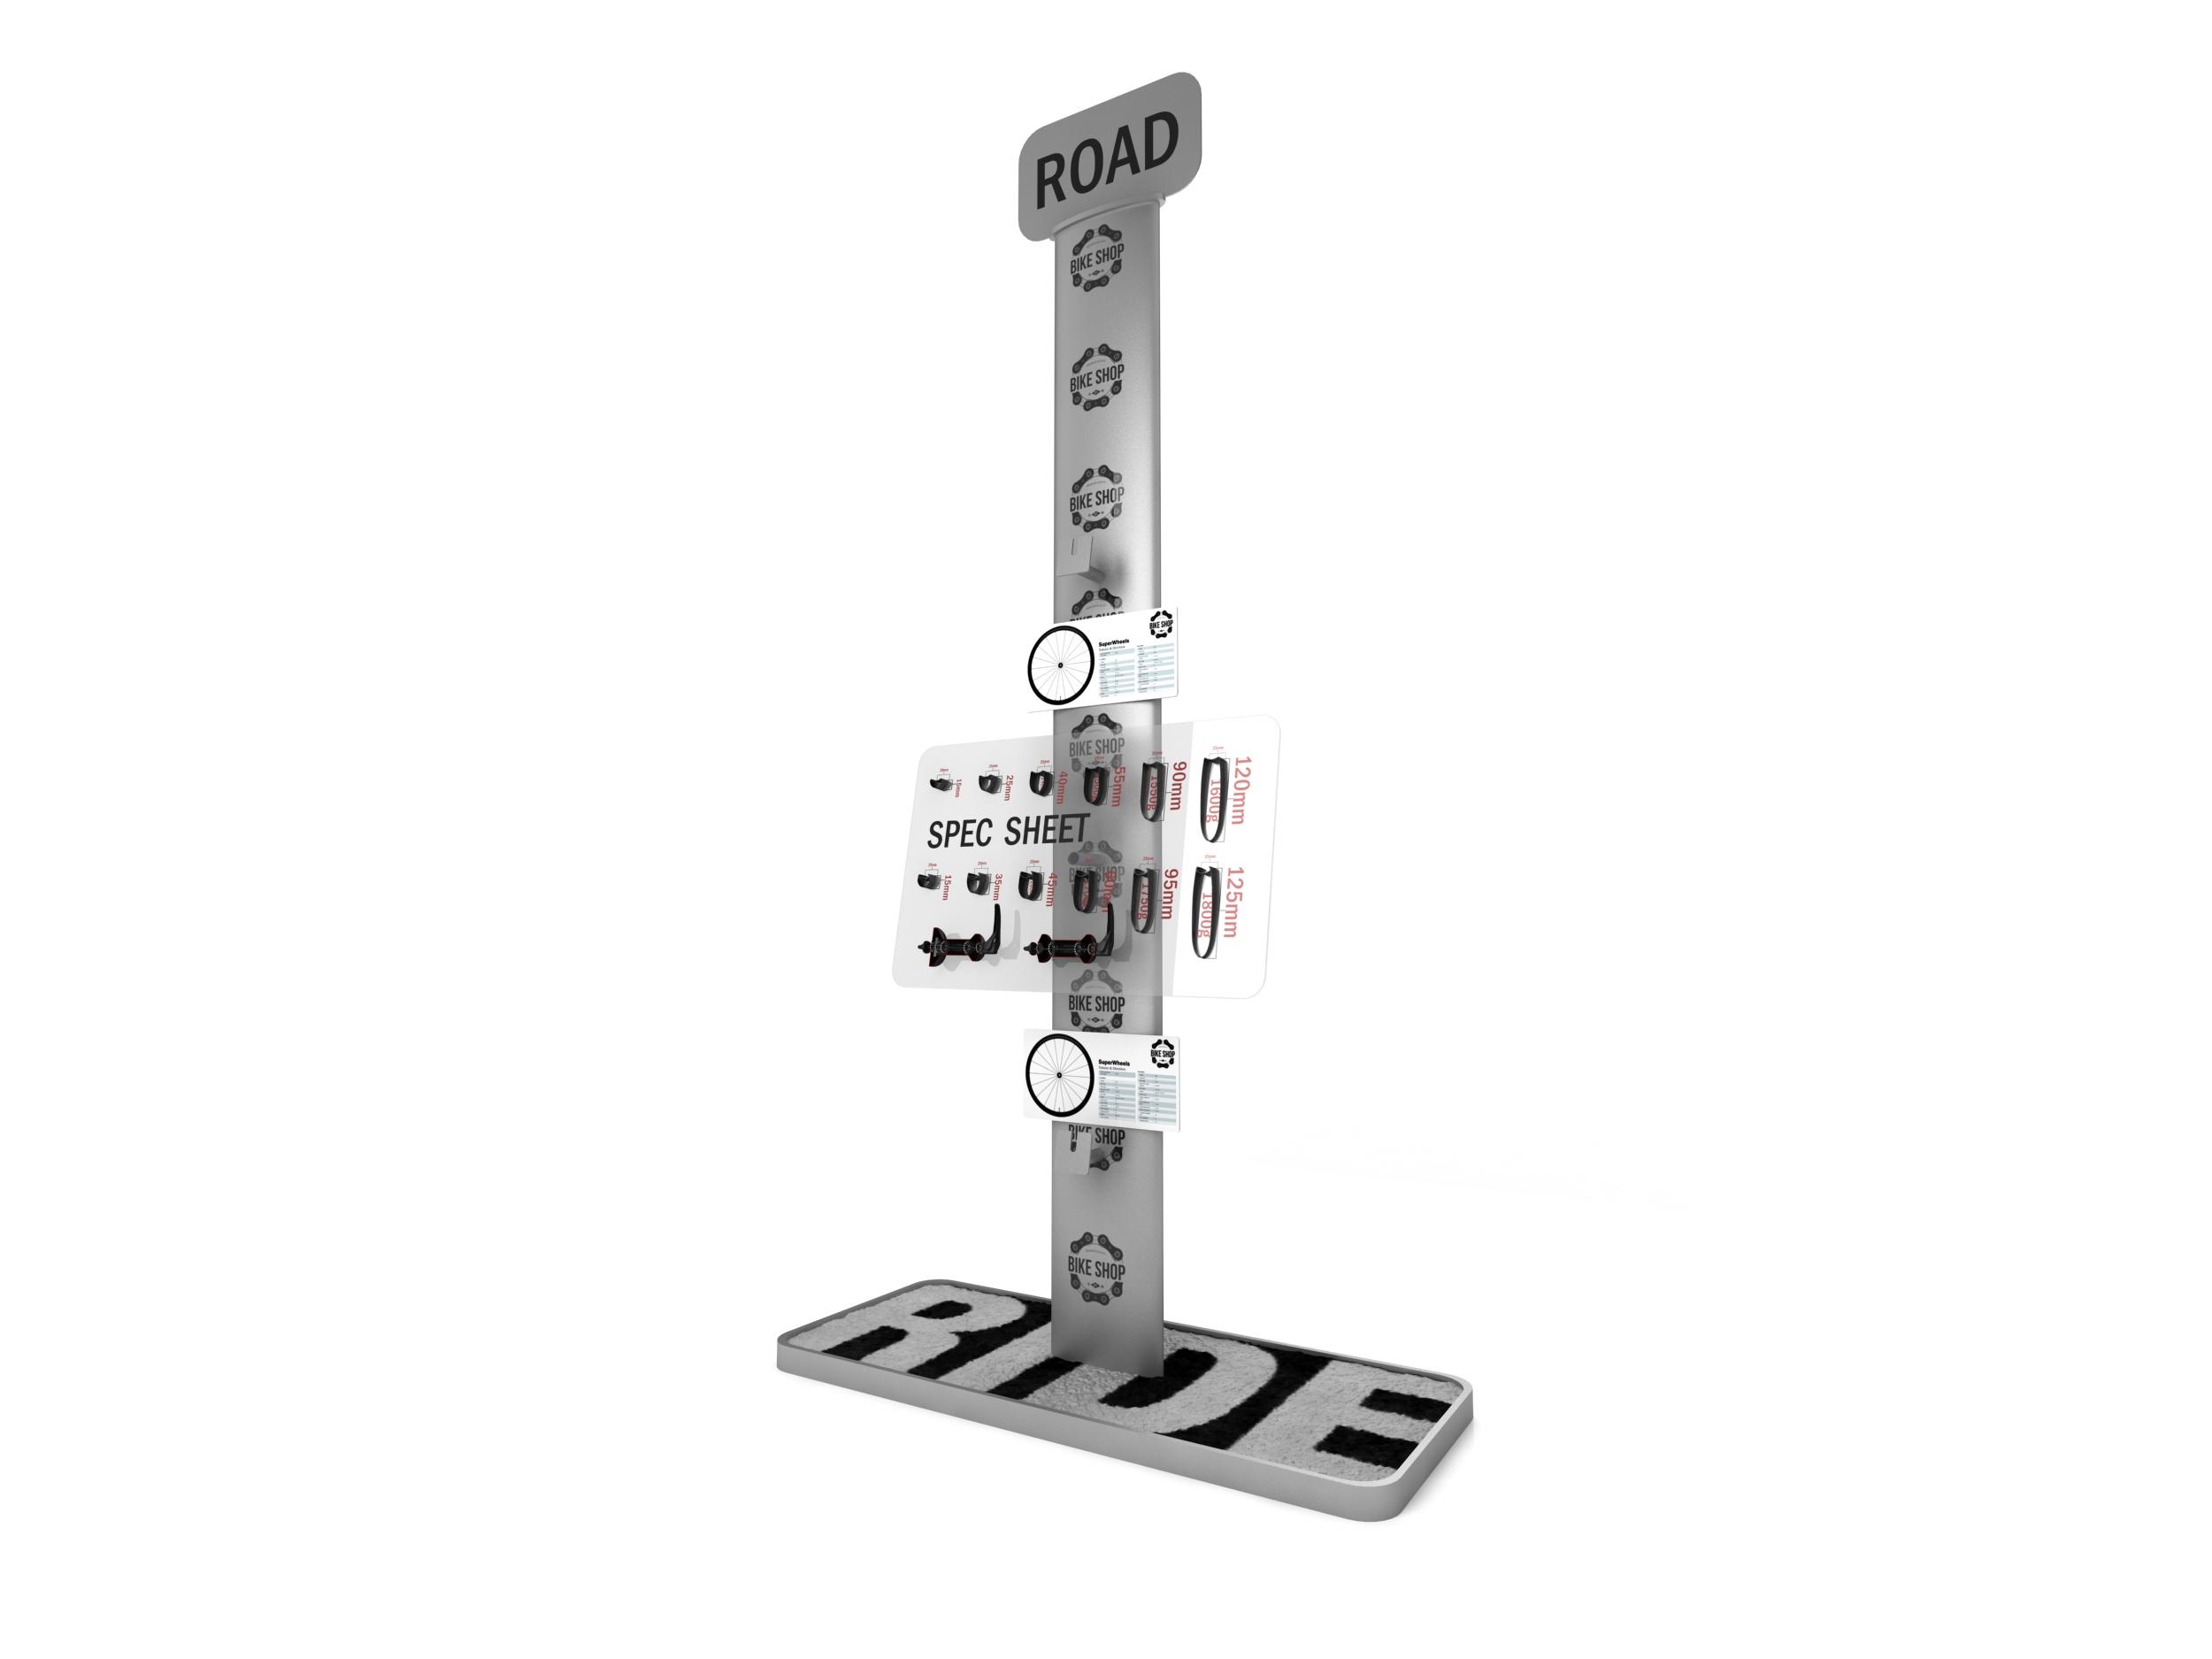 POS_Road Wheel Stand_015.jpg